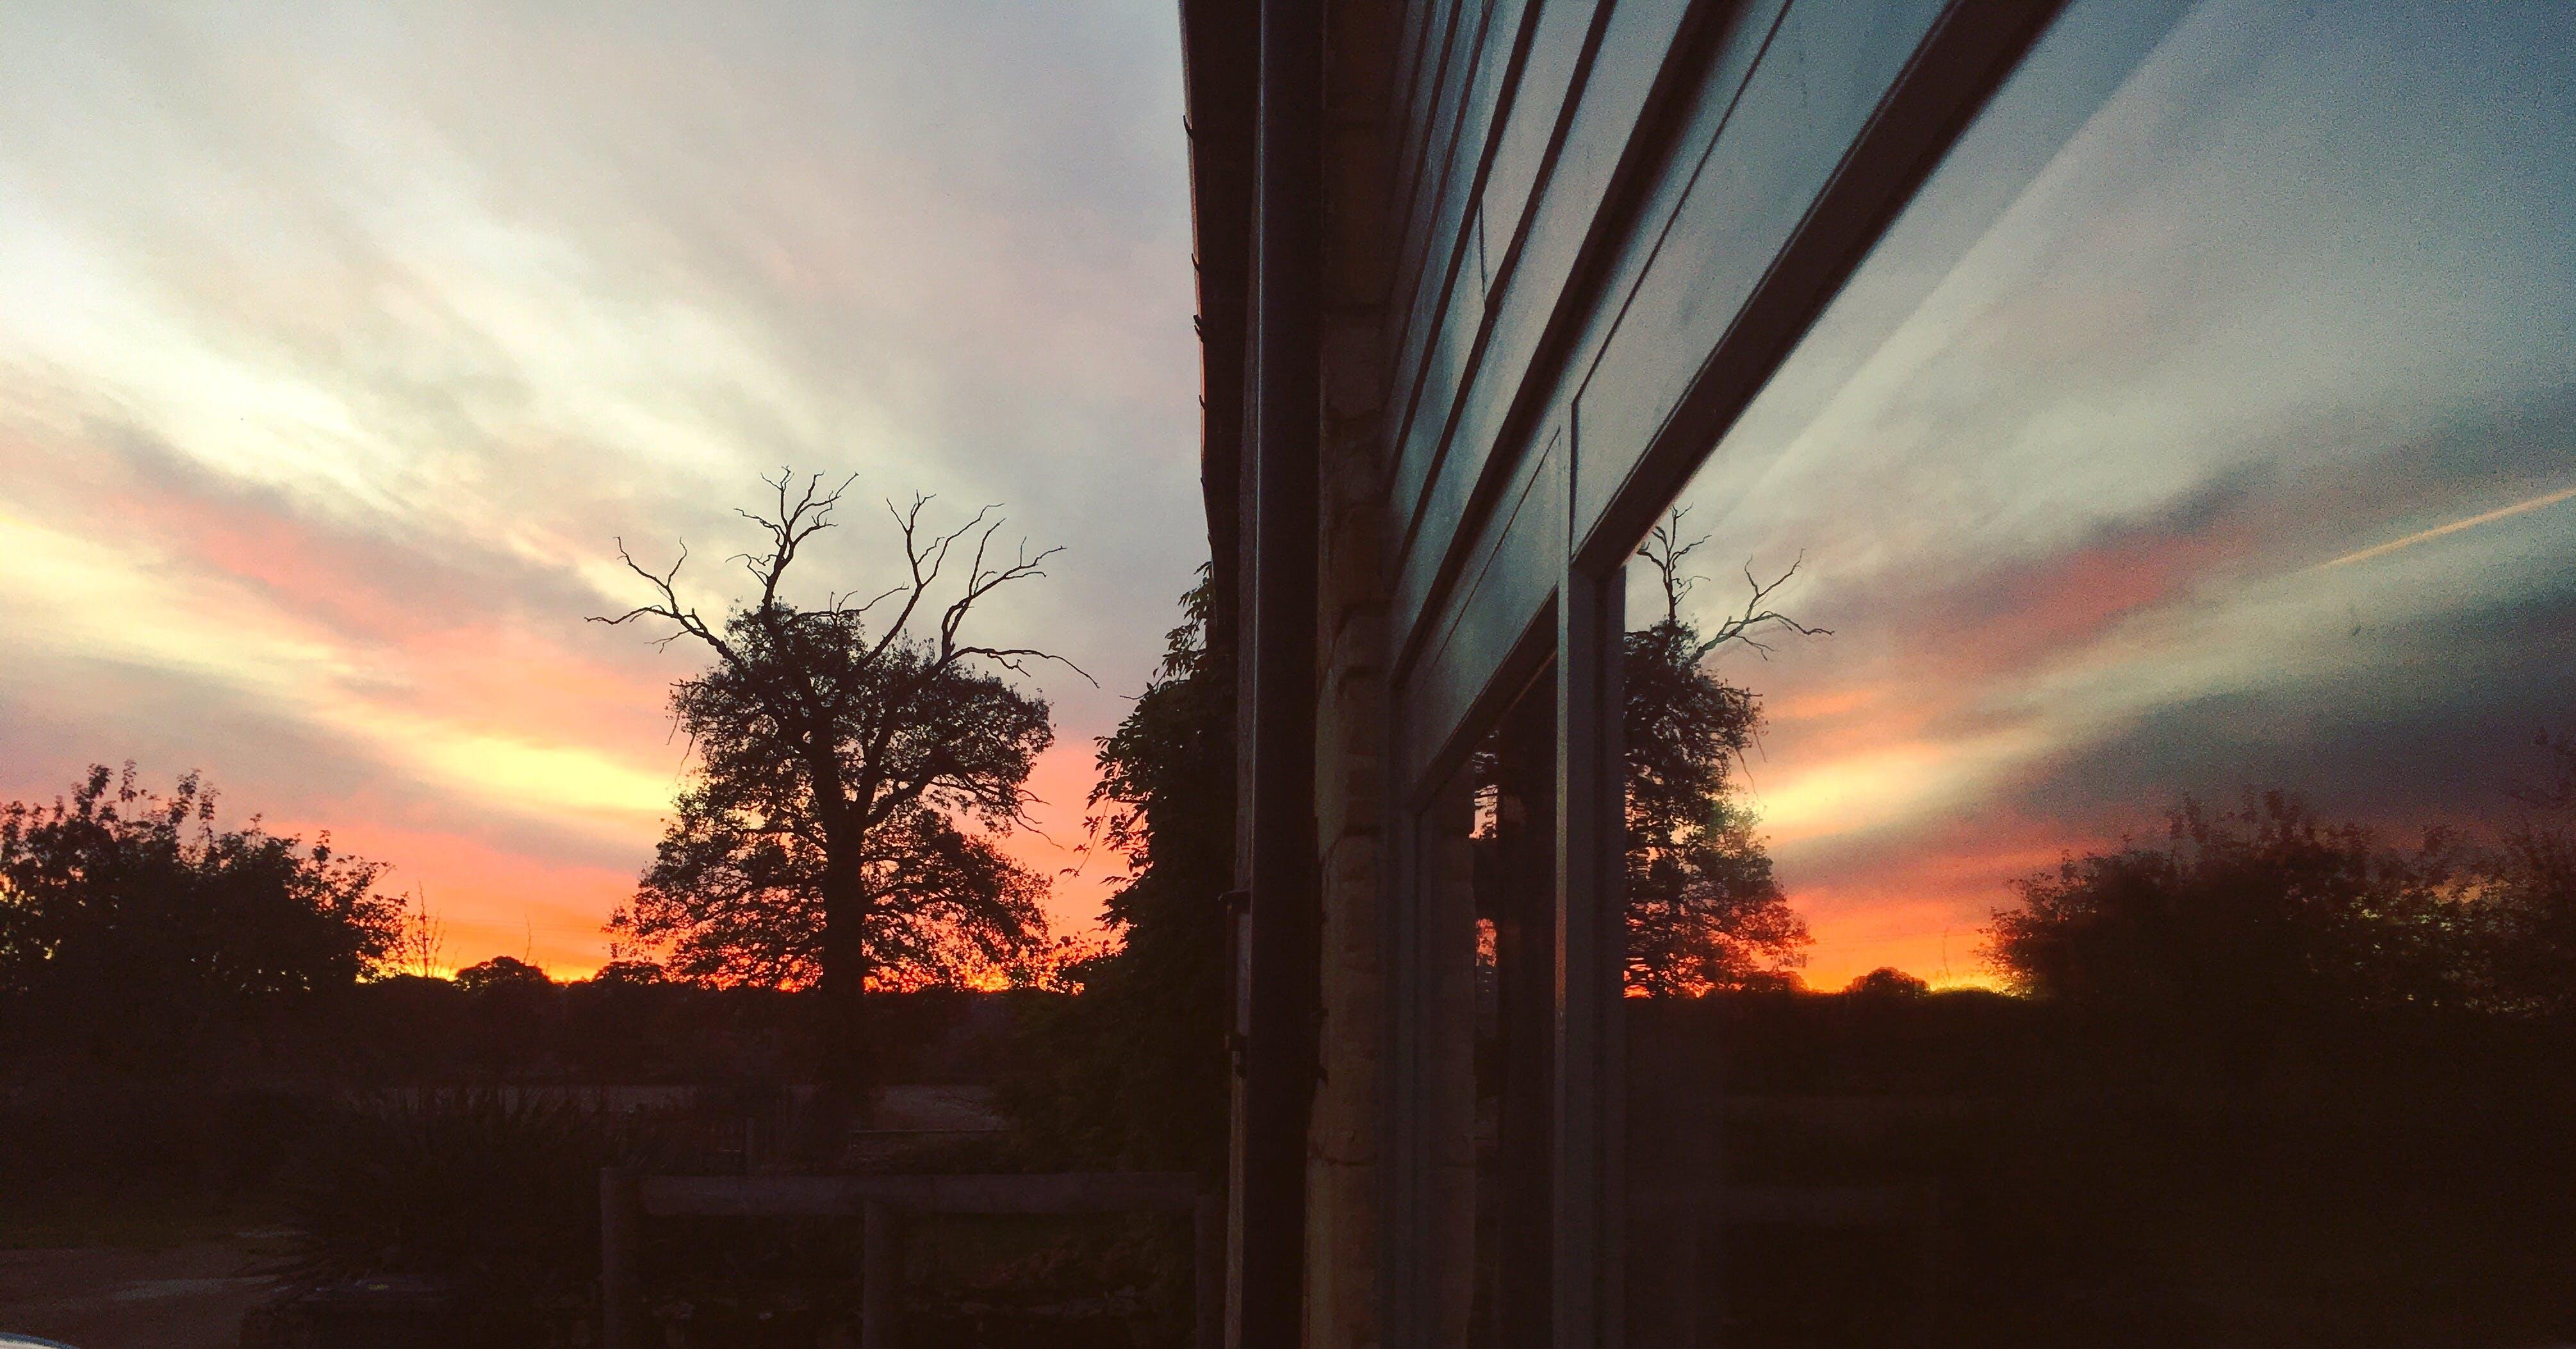 Free stock photo of Sunset Reflection